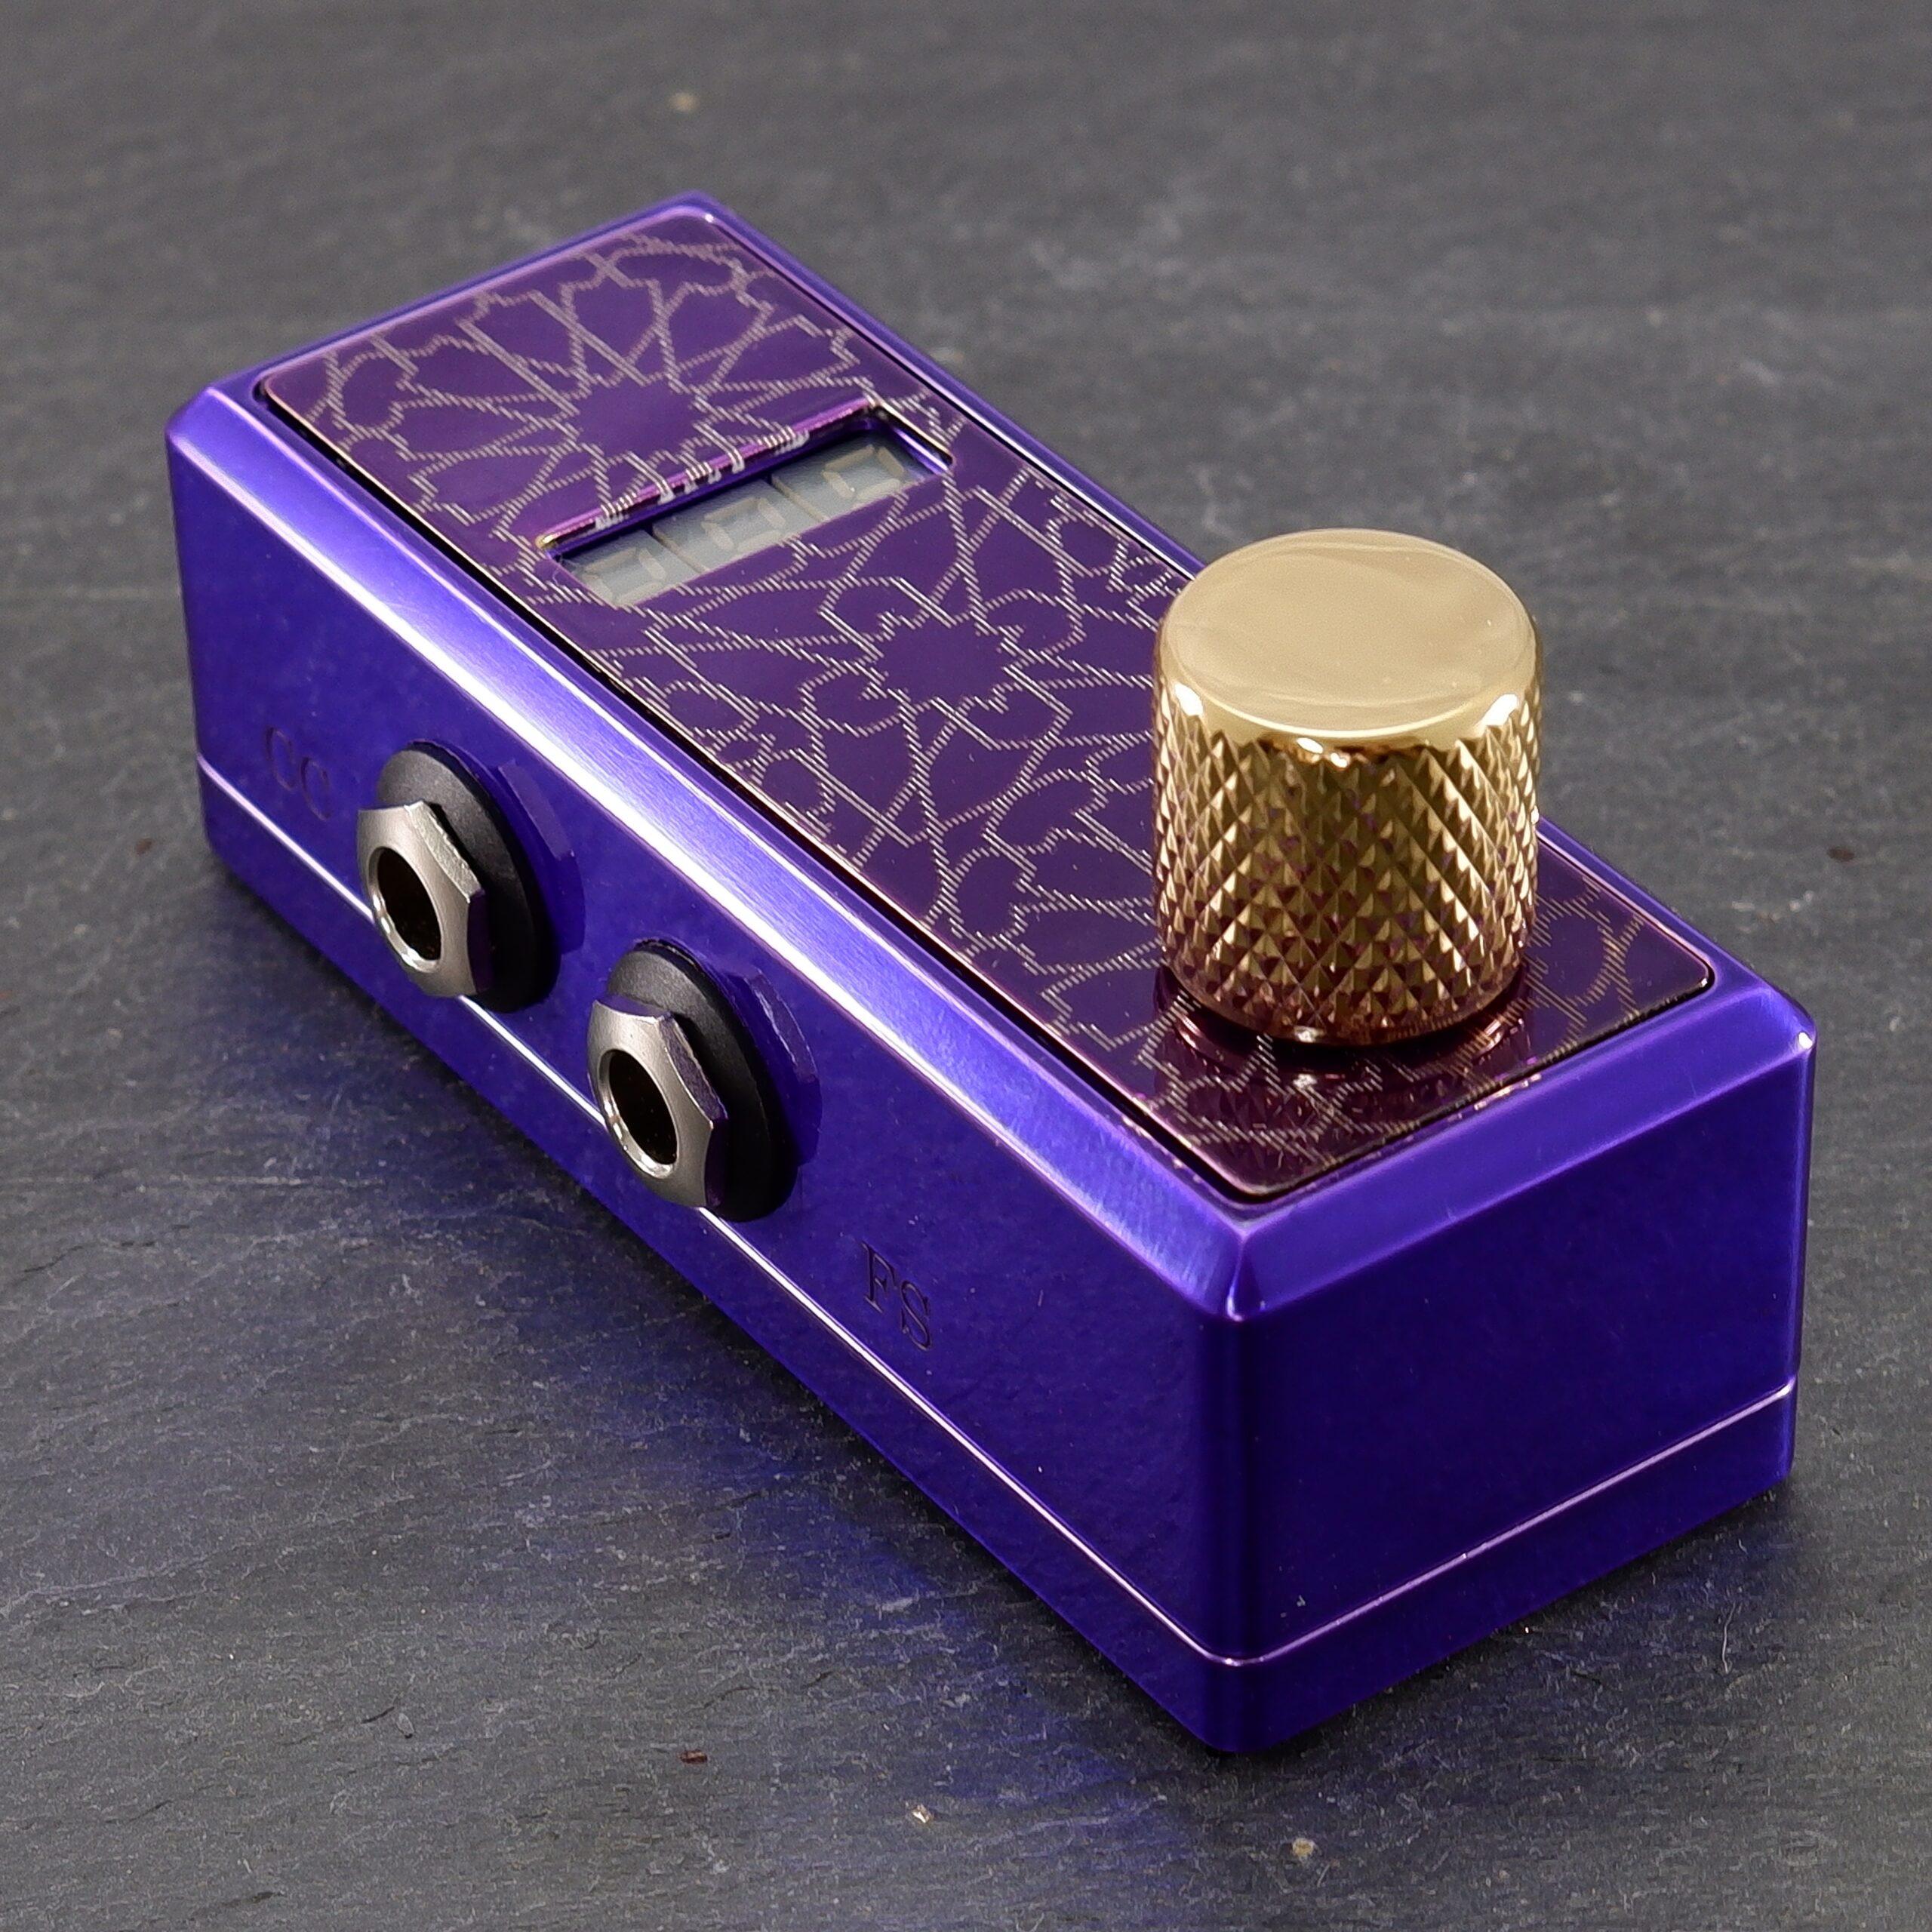 Purple + Nazari Plate Dear Concubine chpt 2